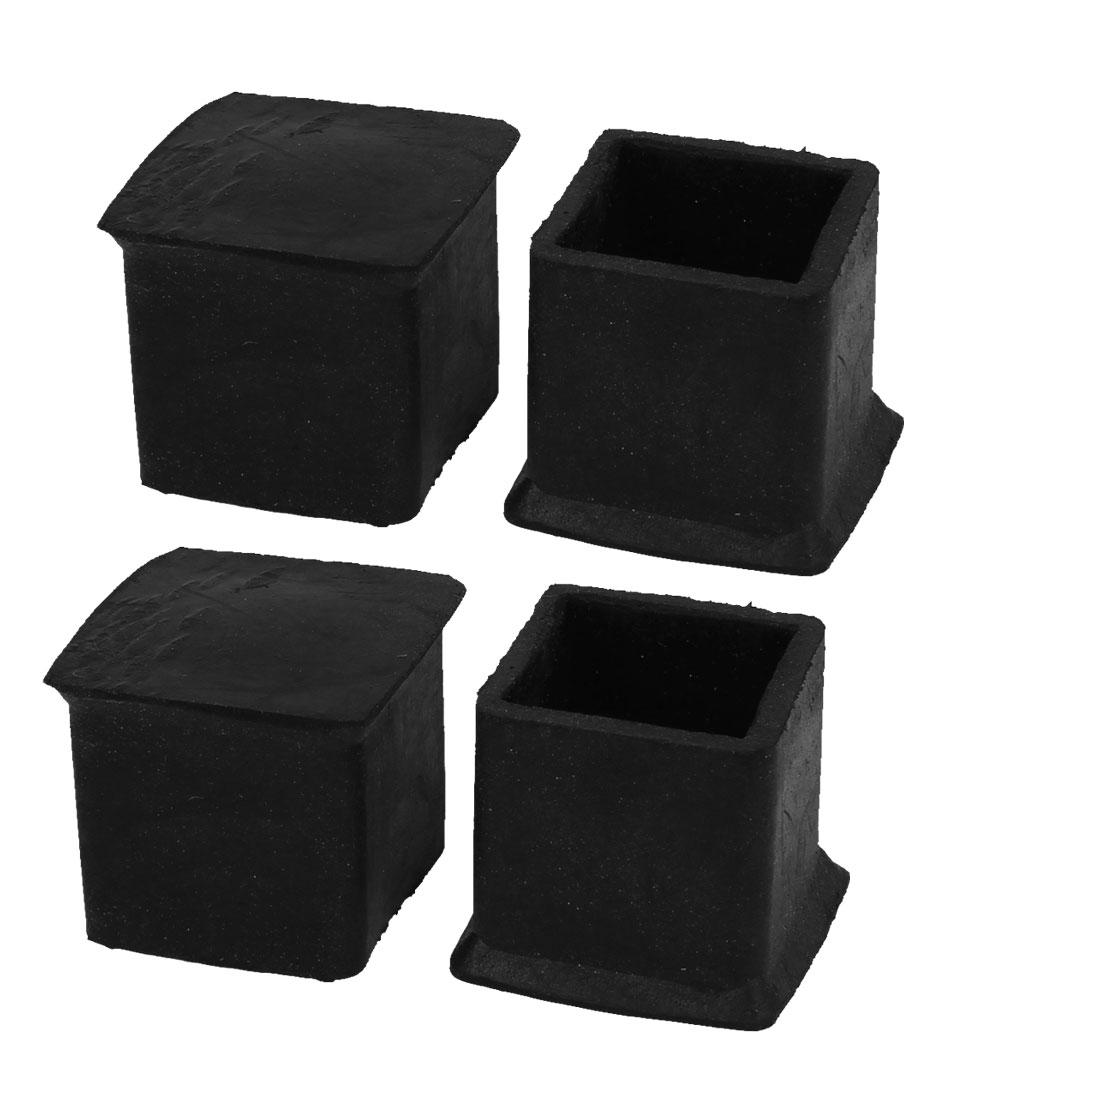 4 Pcs Furniture Table Desk Foot Leg Black Rubber Covers 32 x 32 x 30mm